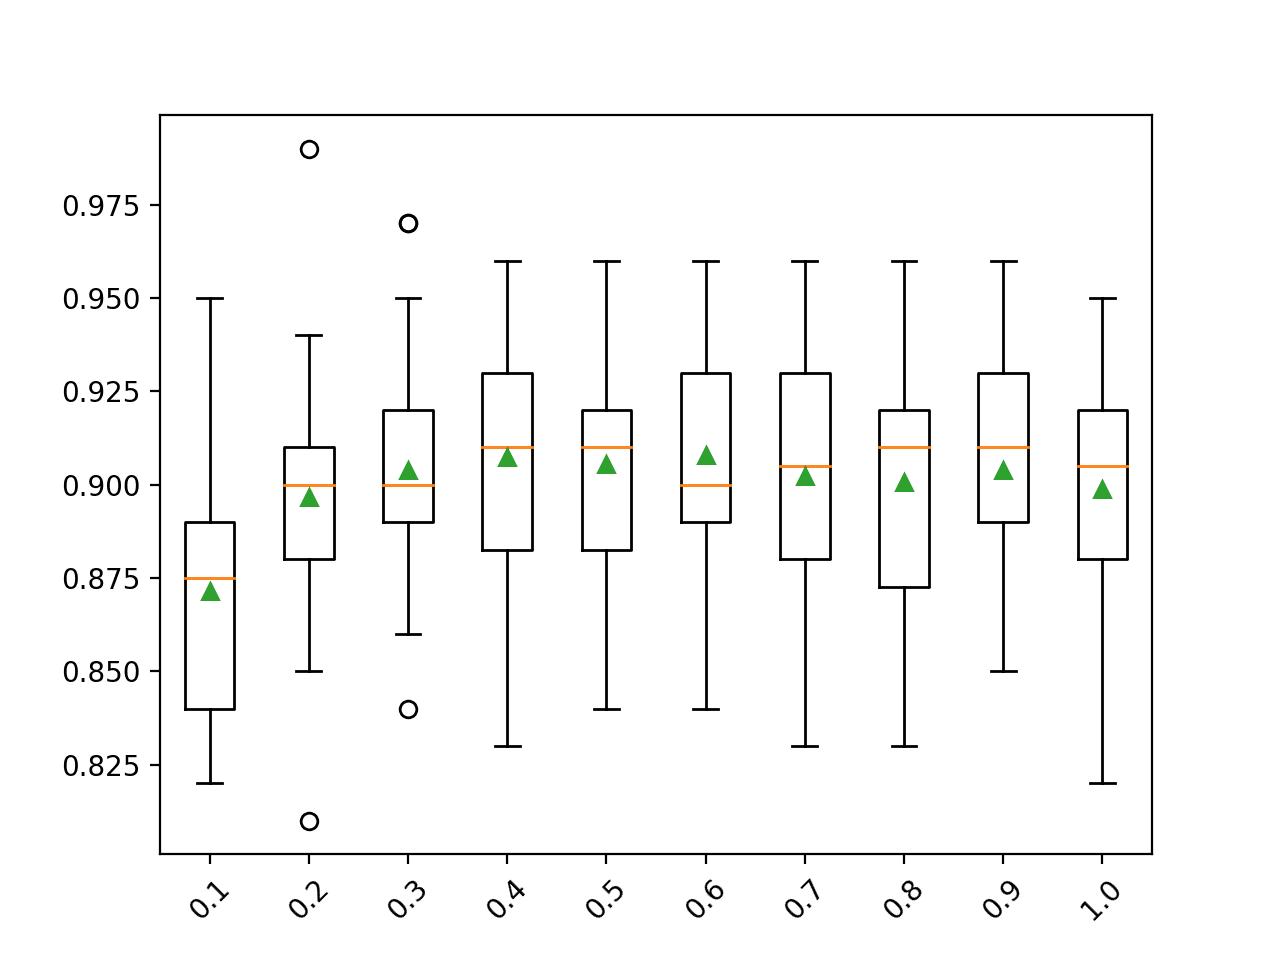 Box Plot of Gradient Boosting Ensemble Sample Size vs. Classification Accuracy